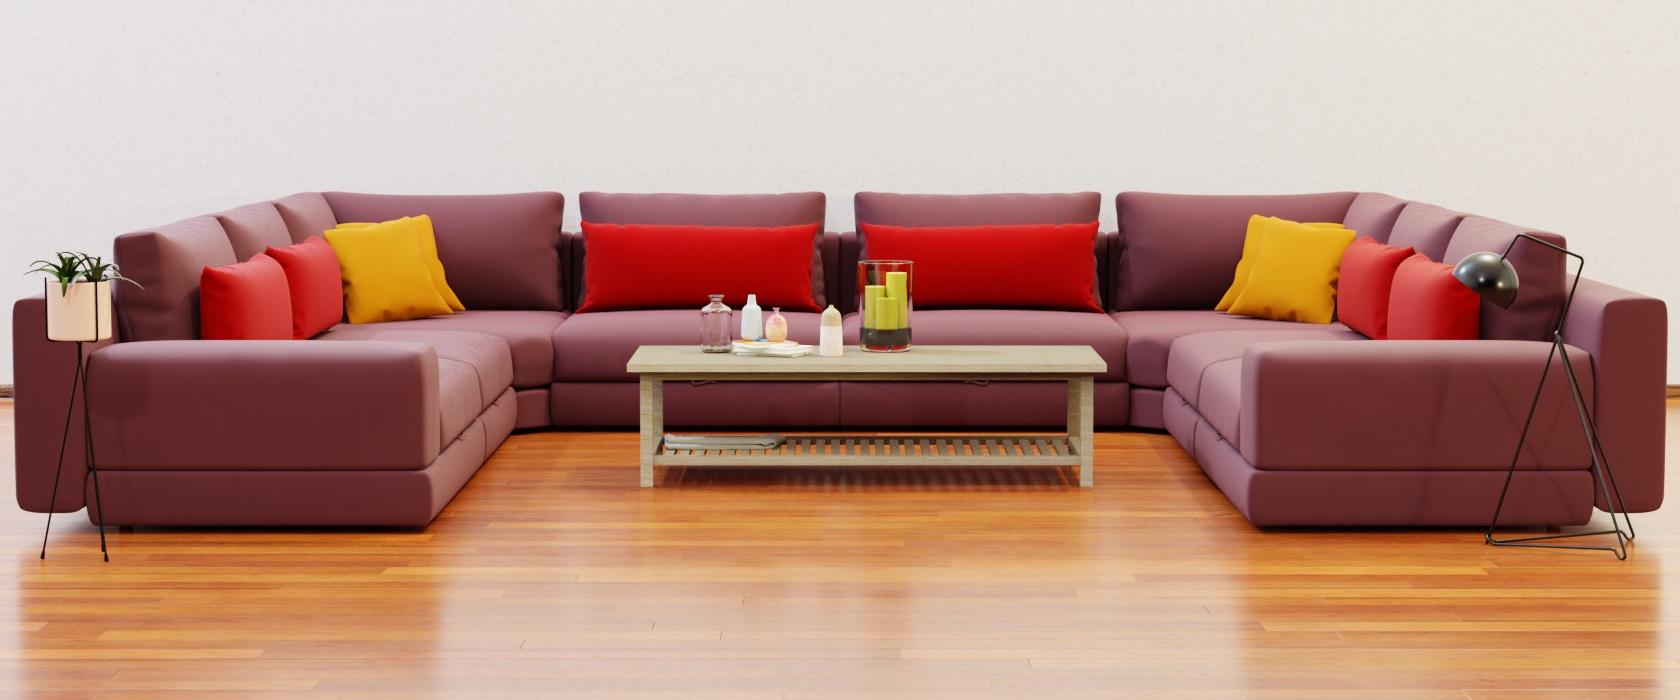 Модульний диван Dario 440x355 - Фото 2 - Pufetto